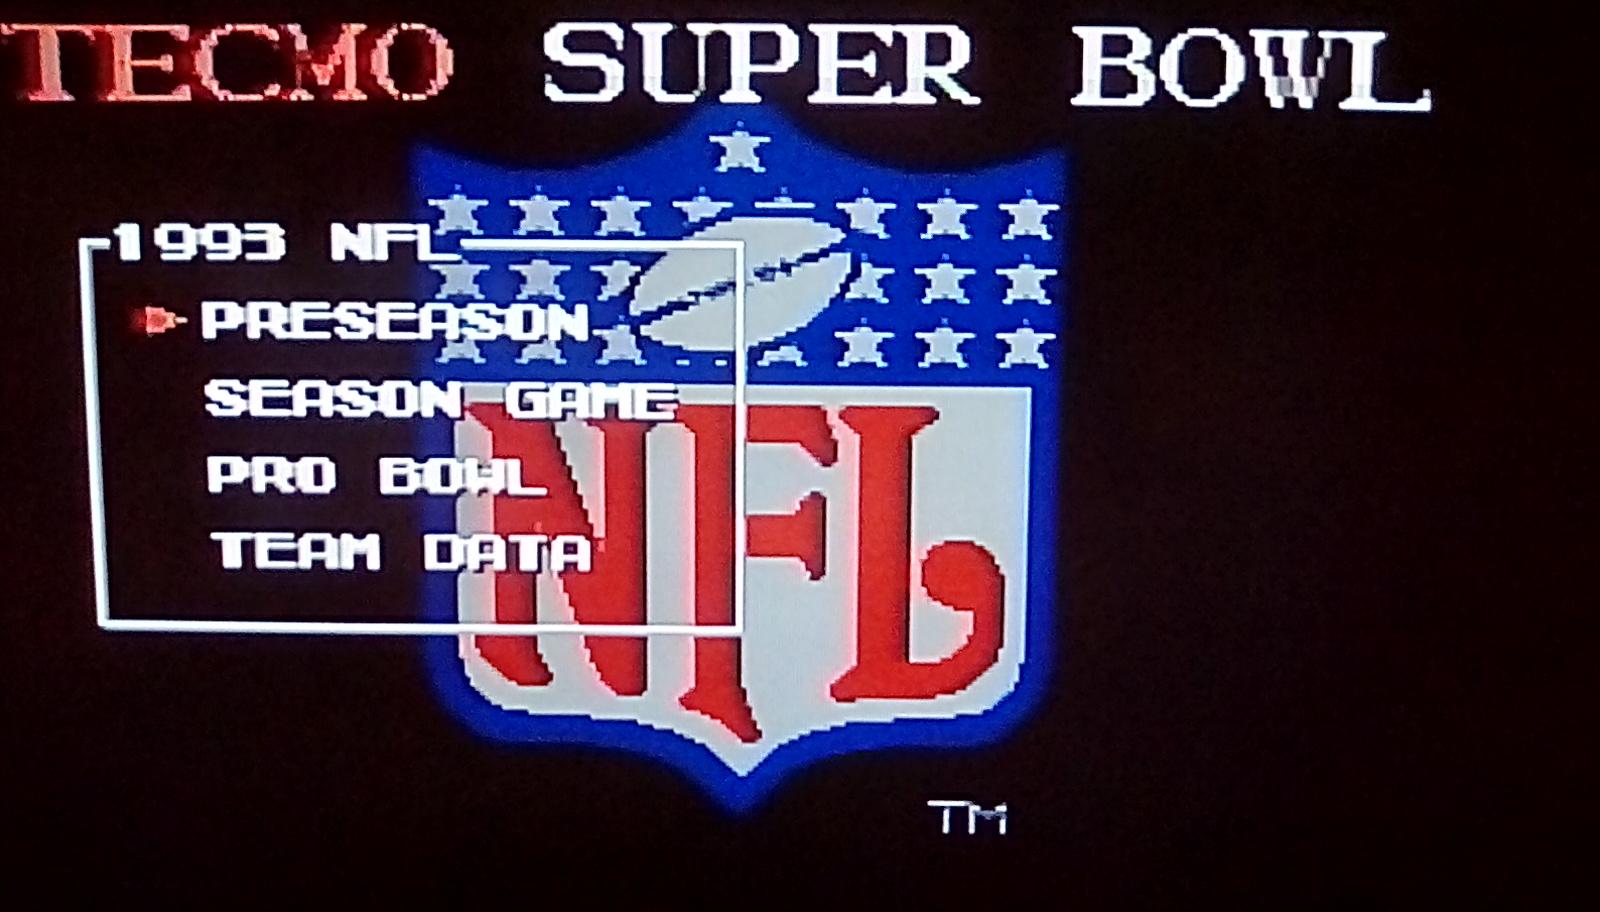 Tecmo Super Bowl [Most Rushing Yards] [Preseason] 491 points